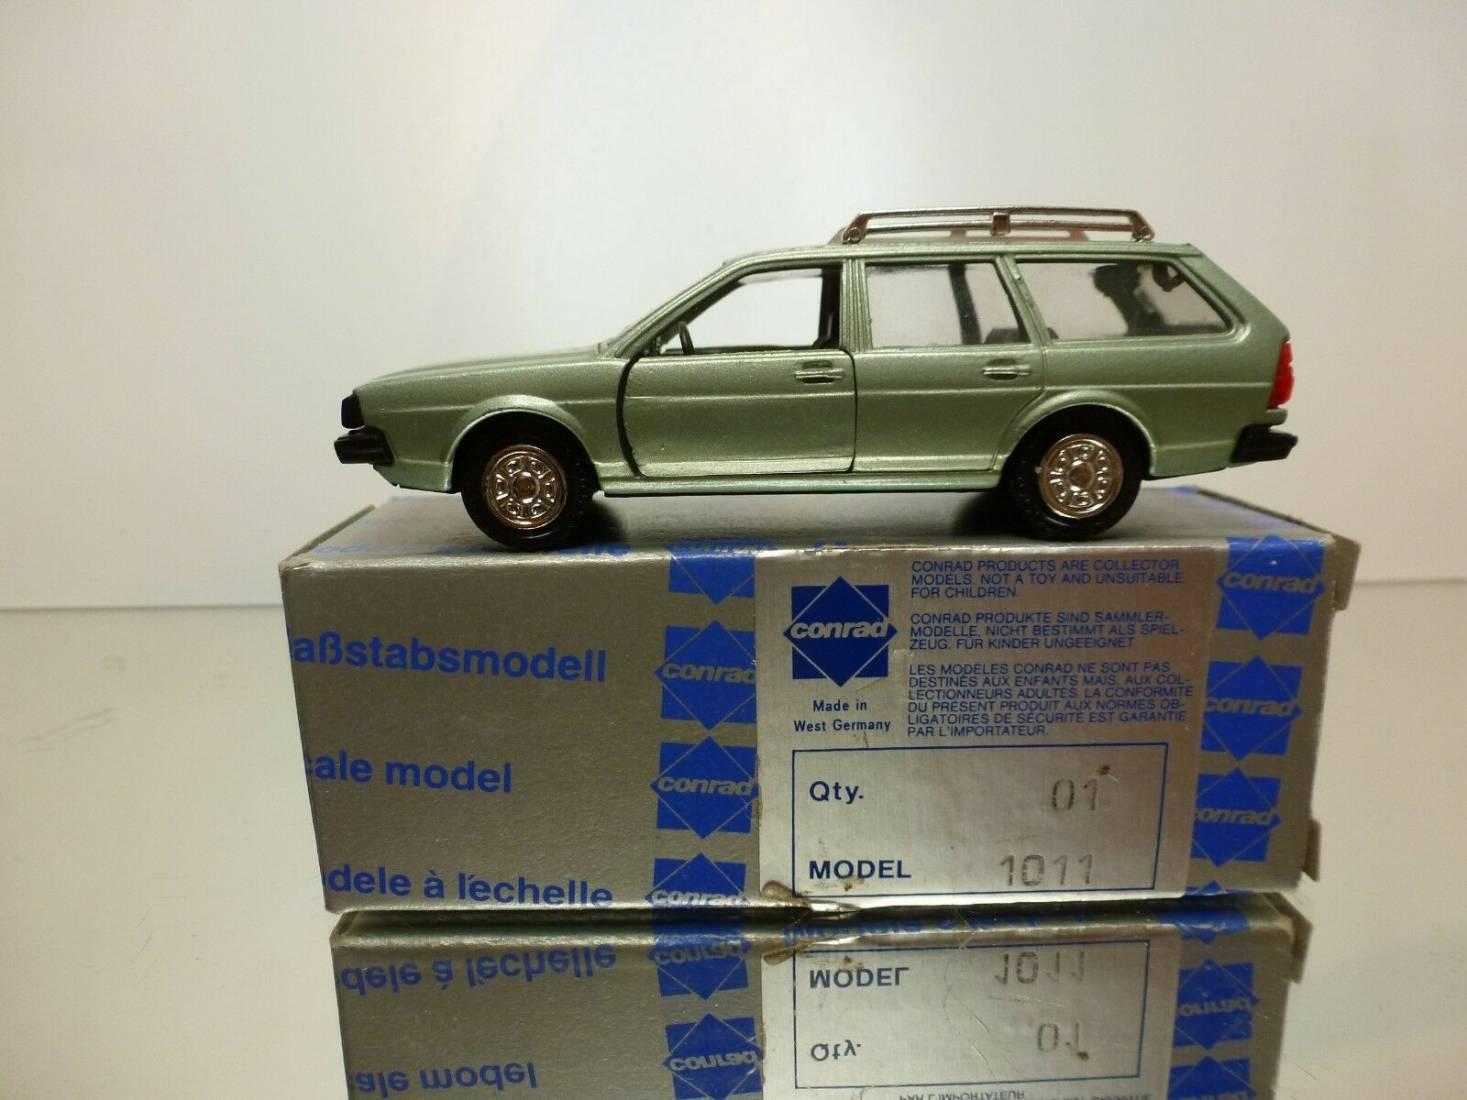 Conrad-1011-Vw-Volkswagen-Passat-Variant.jpg